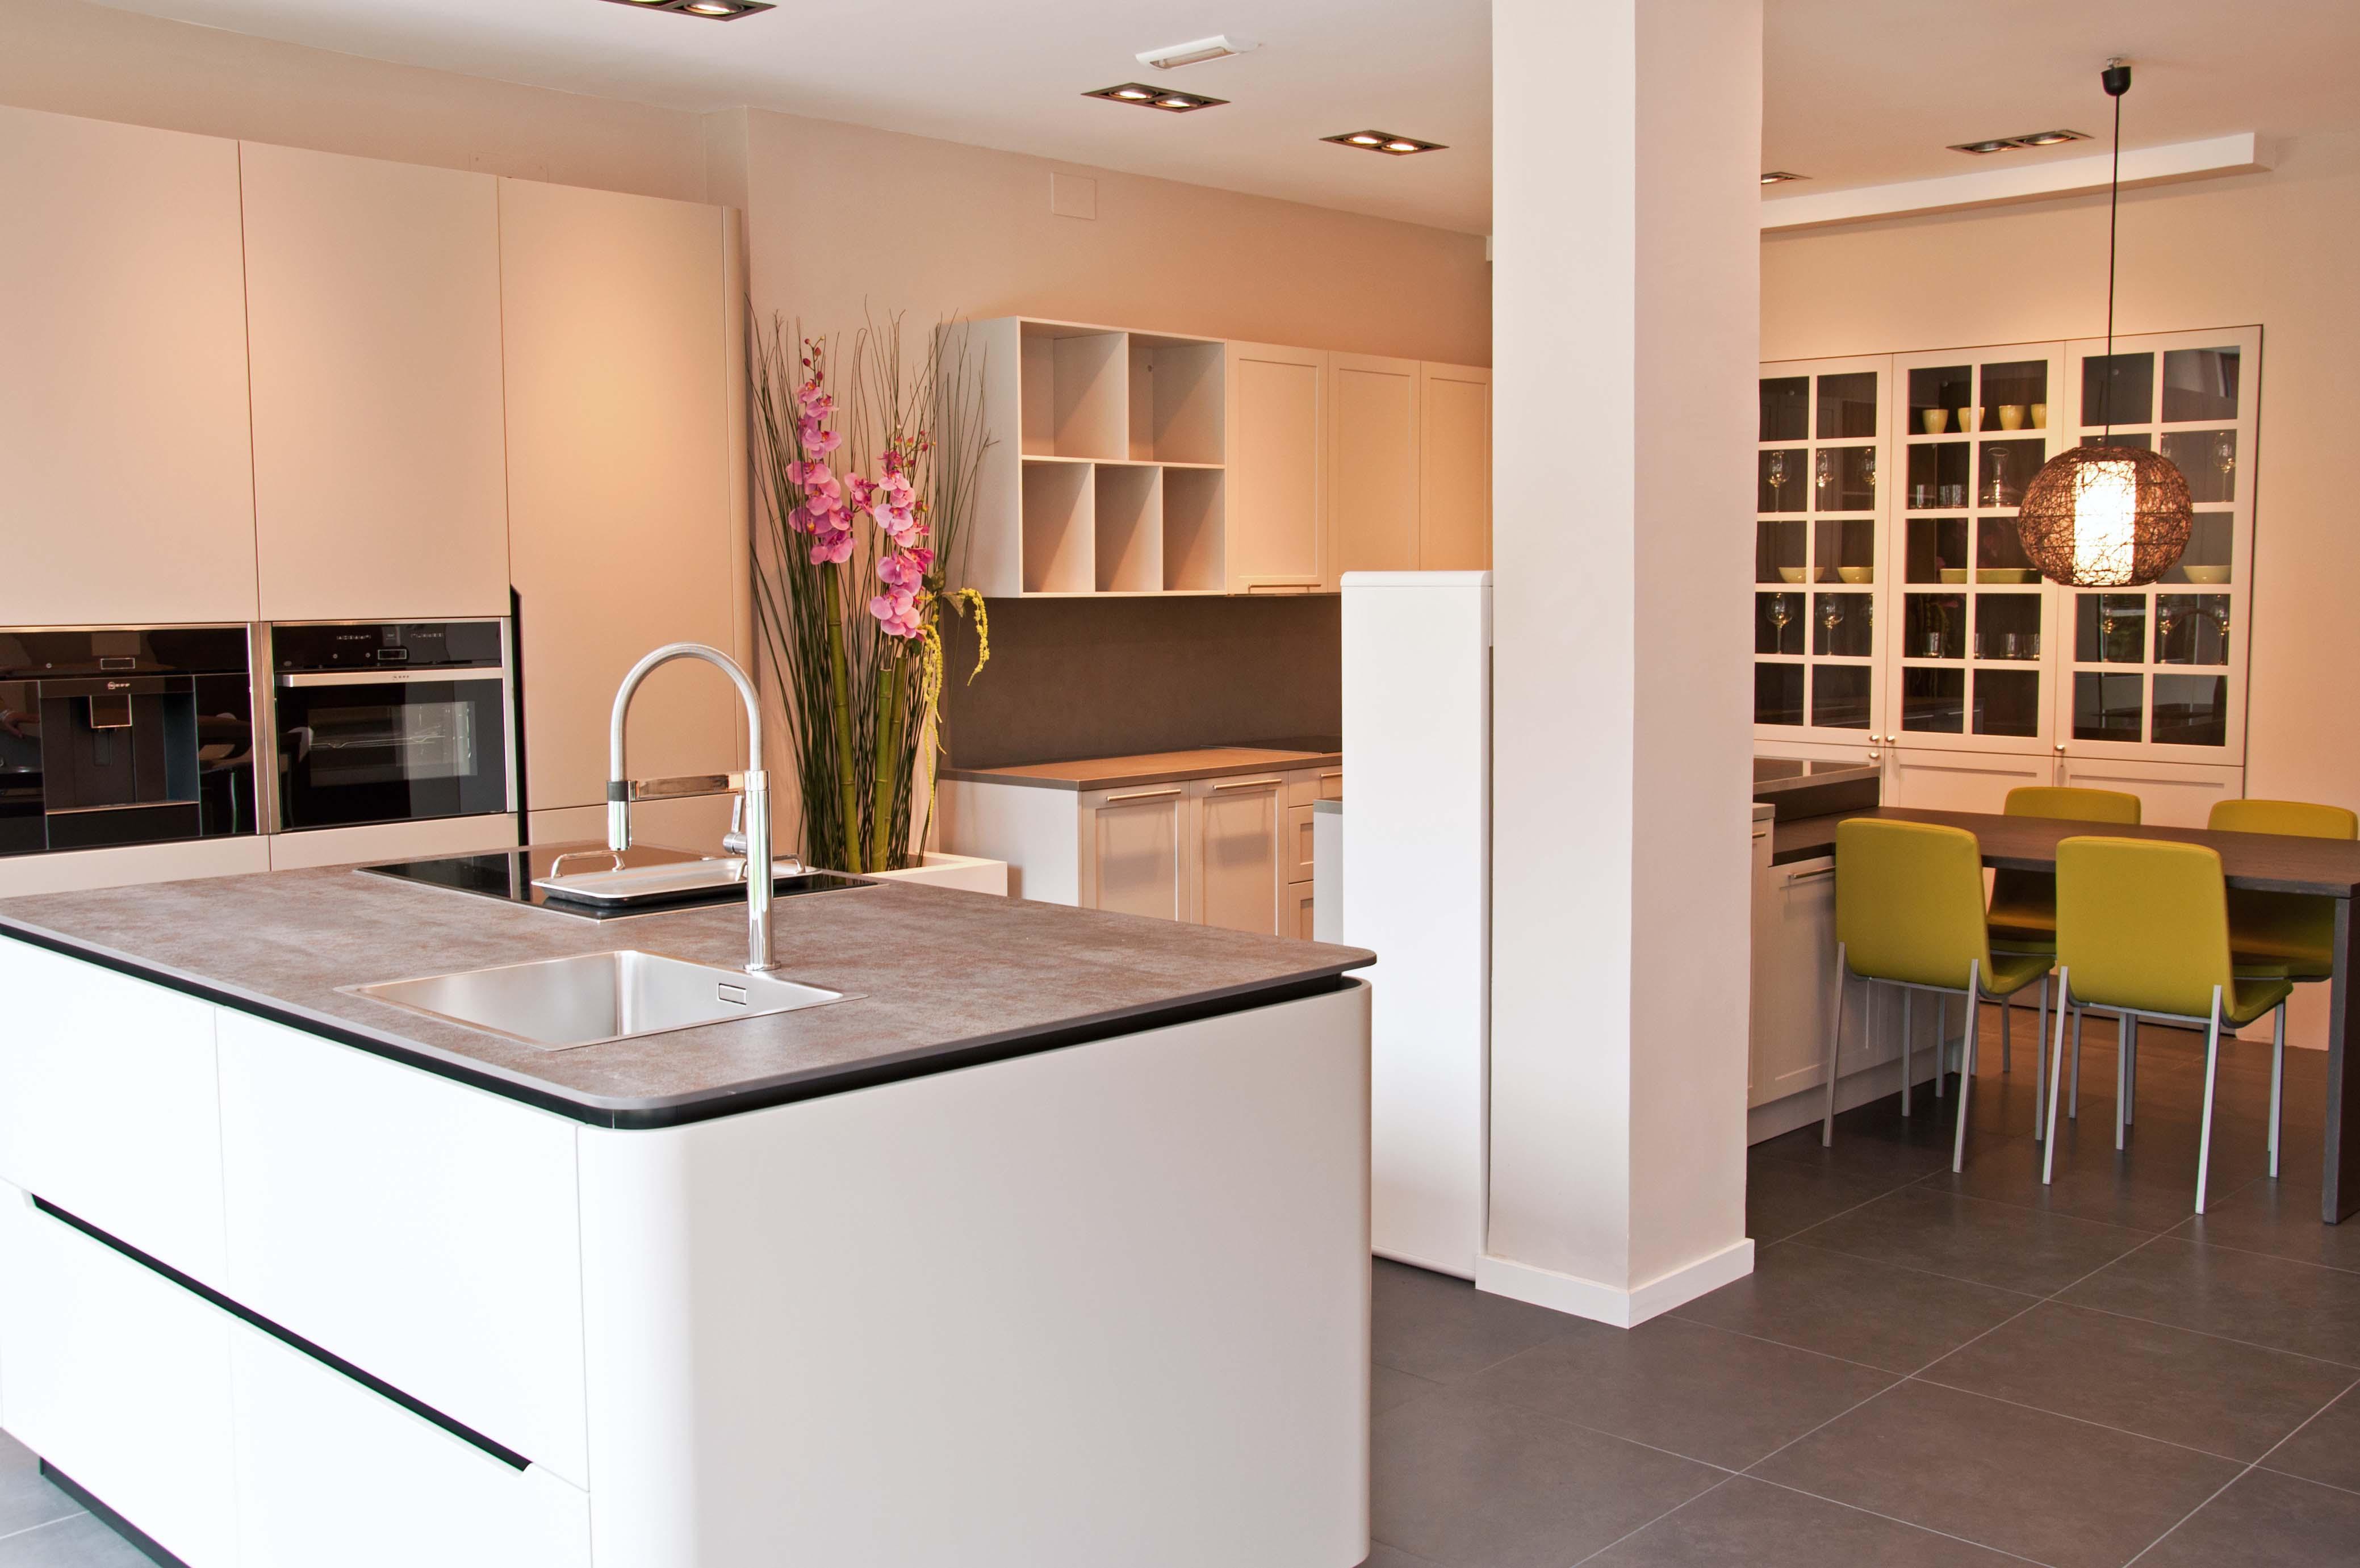 Muebles Pozuelo - Muebles De Cocina En Pozuelo De Alarc N [mjhdah]http://www.nmstudio.es/wp-content/uploads/2015/01/Ba%C3%B1os-Pozuelo-4.jpg